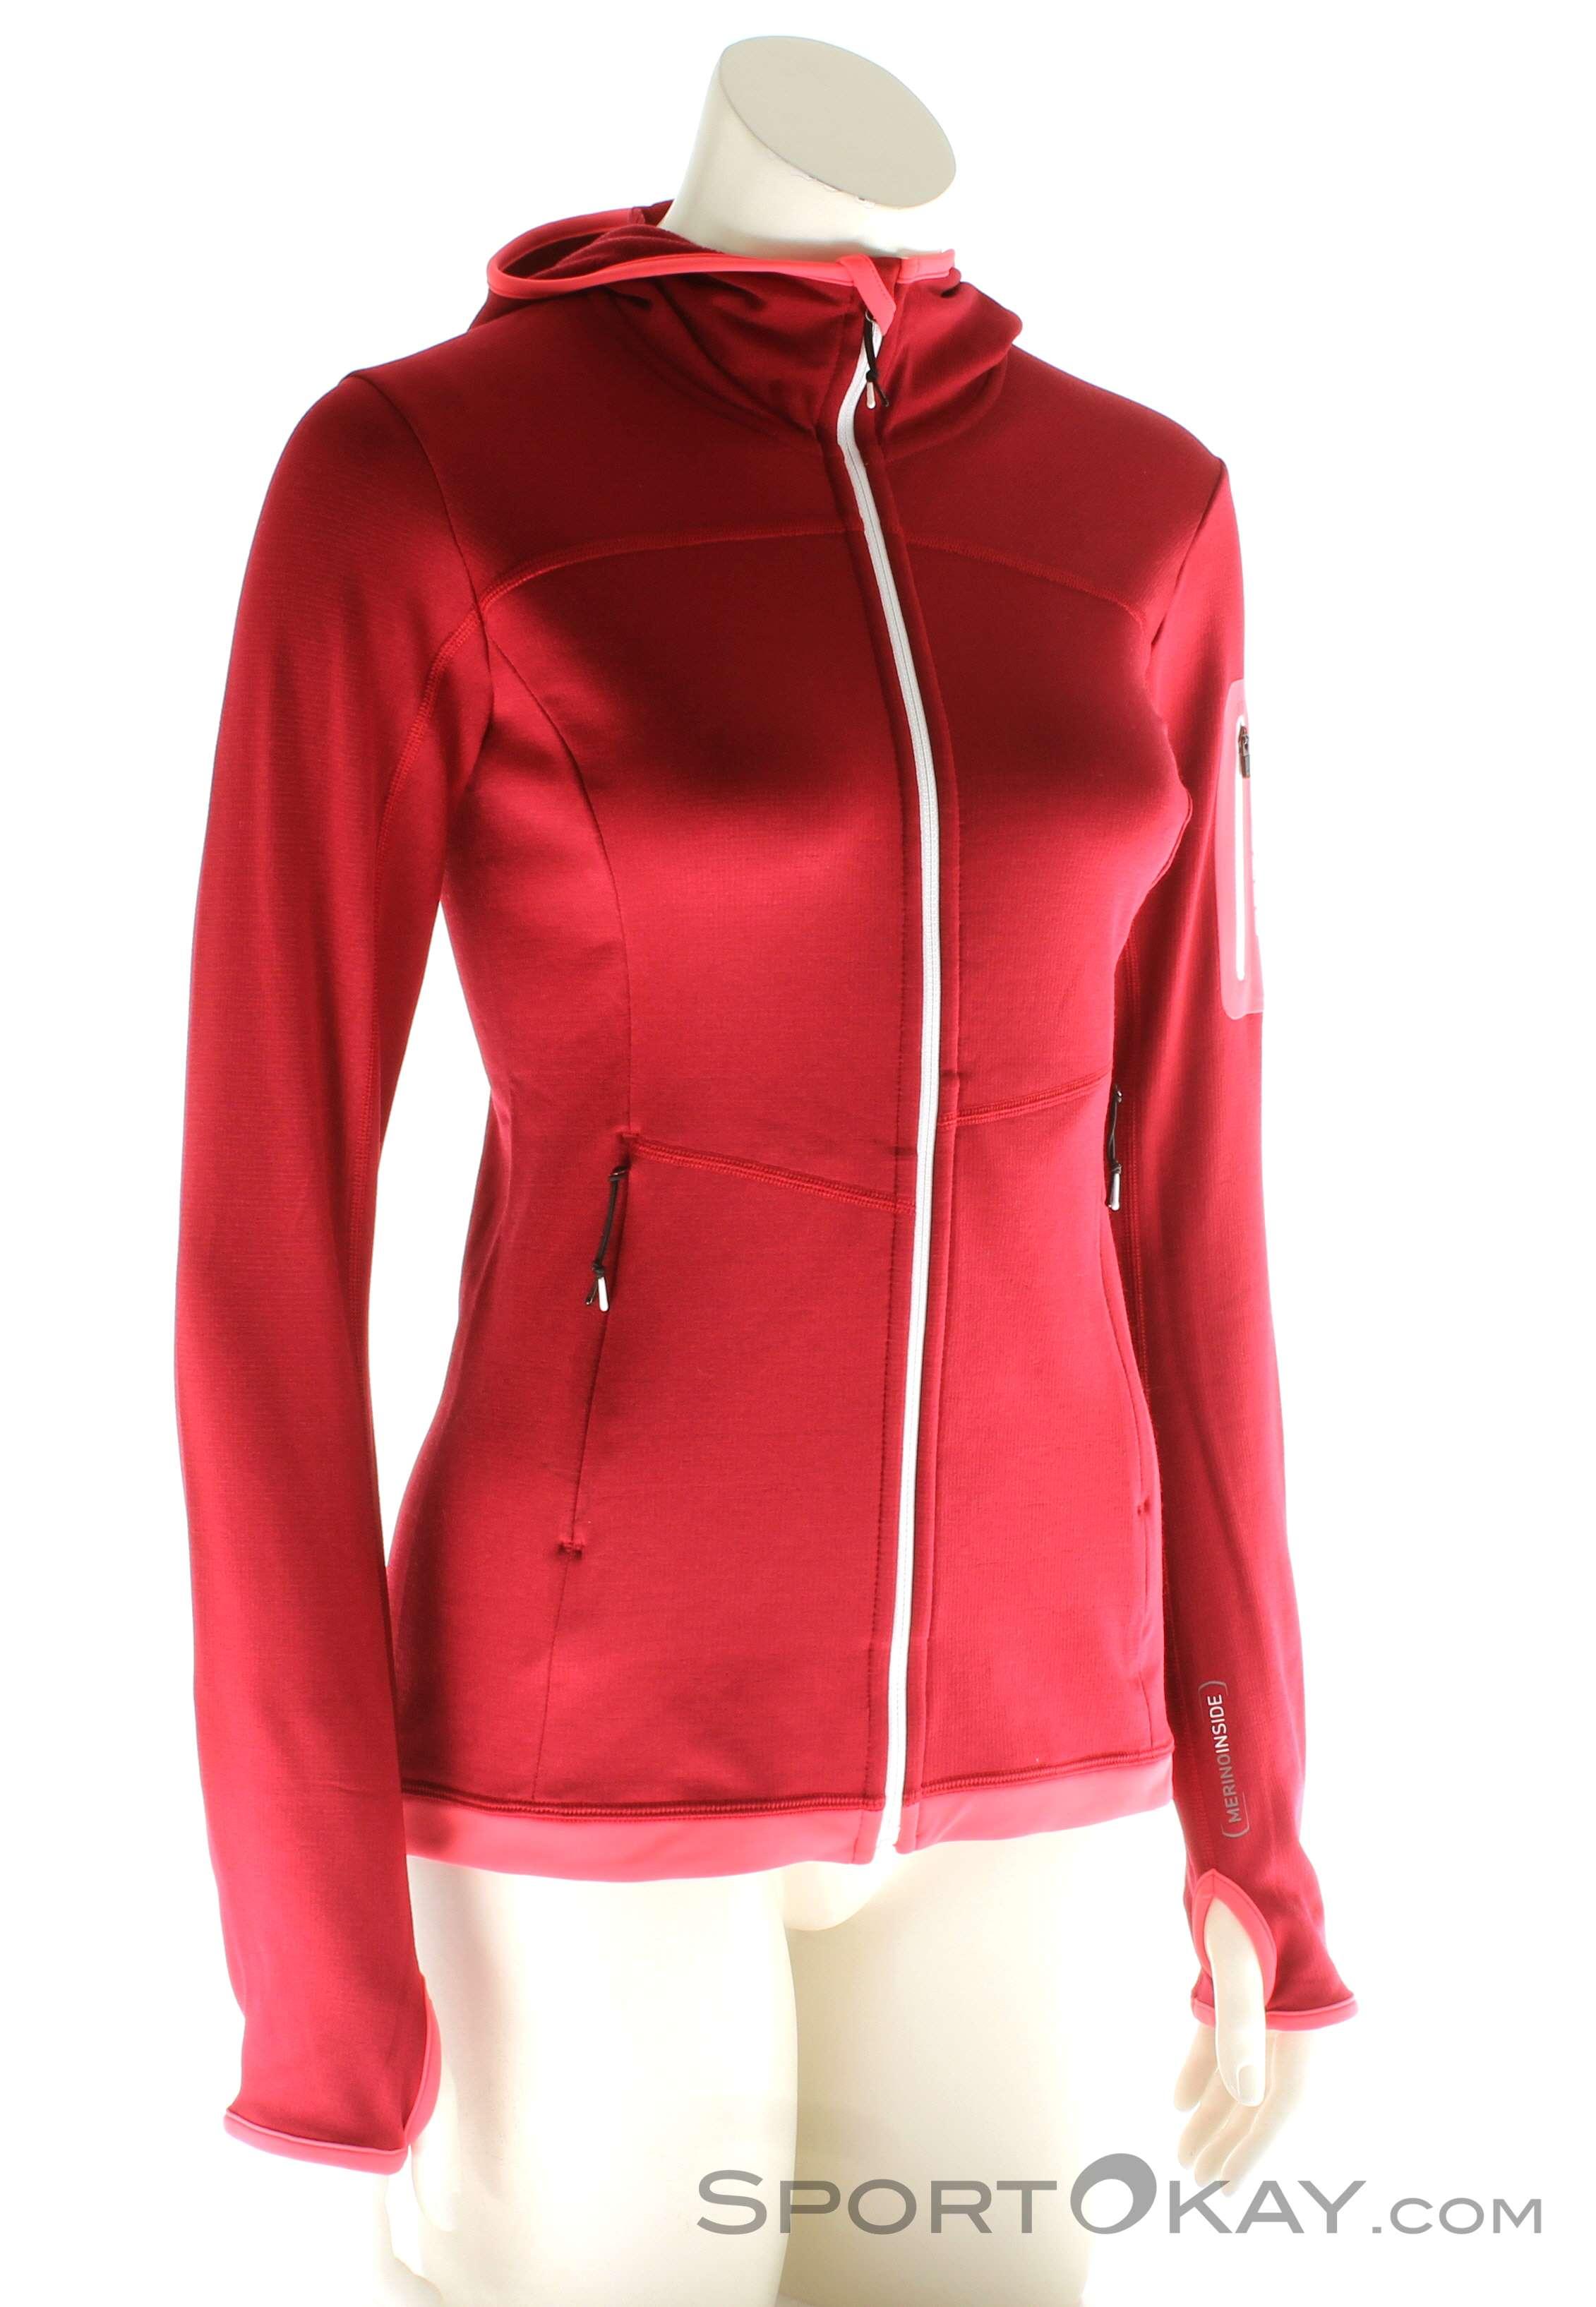 Ortovox Fleece Light Hoody Damen Tourensweater, Ortovox, Rot, , Damen, 0016-10578, 5637562045, 4250875282919, N1-01.jpg